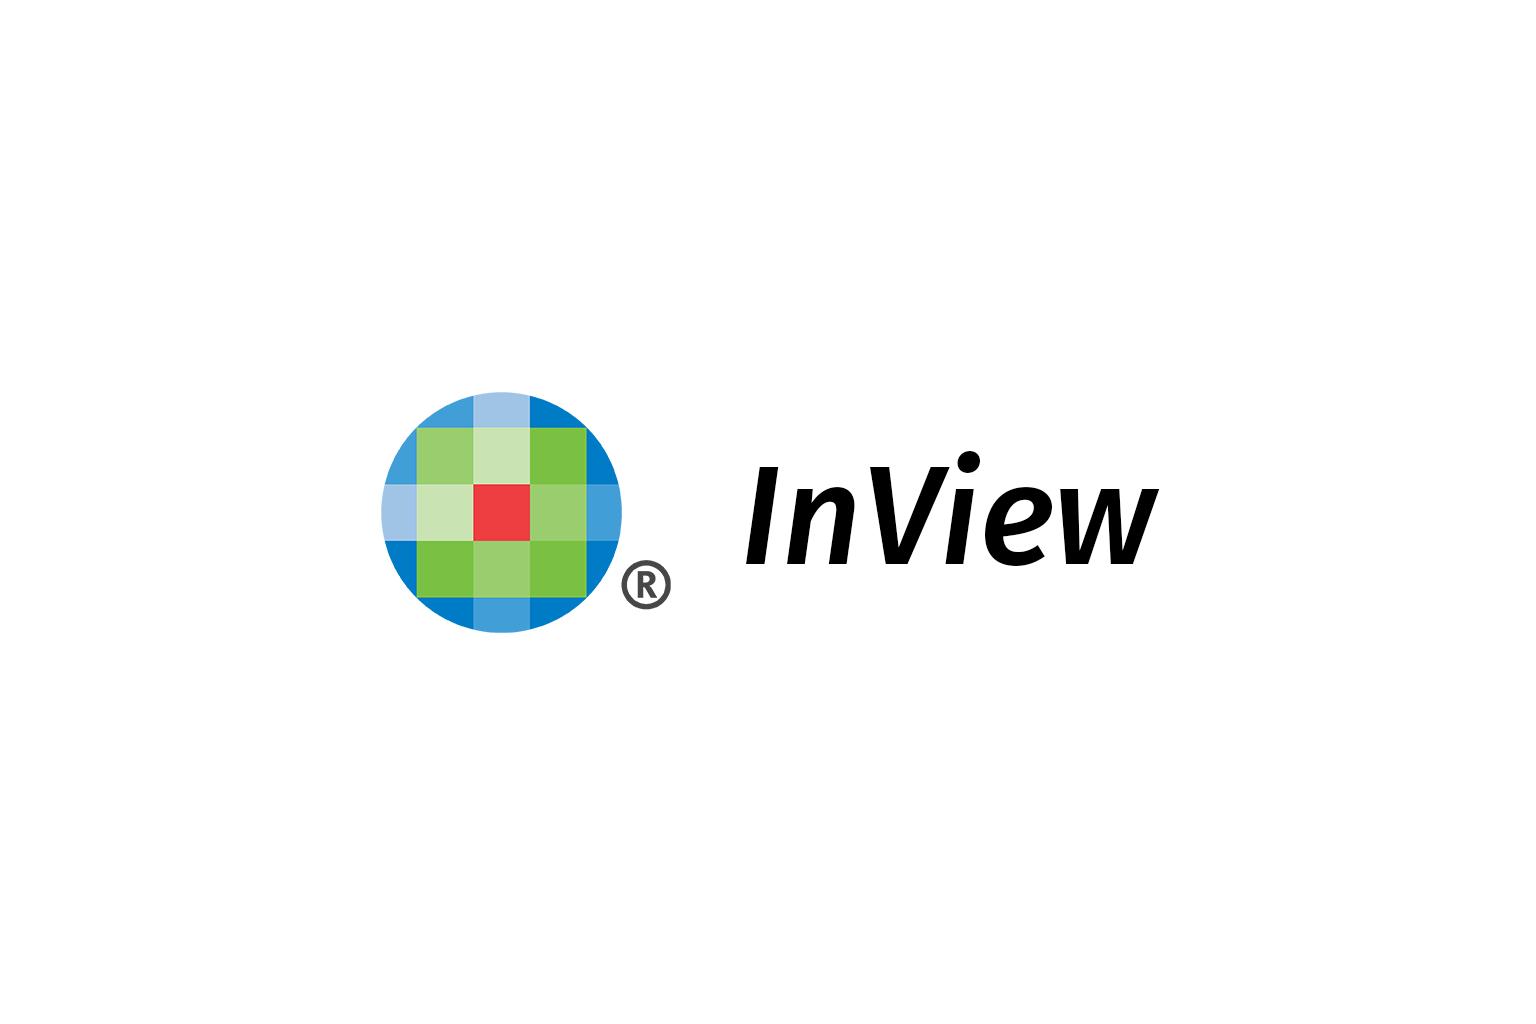 Logo InView